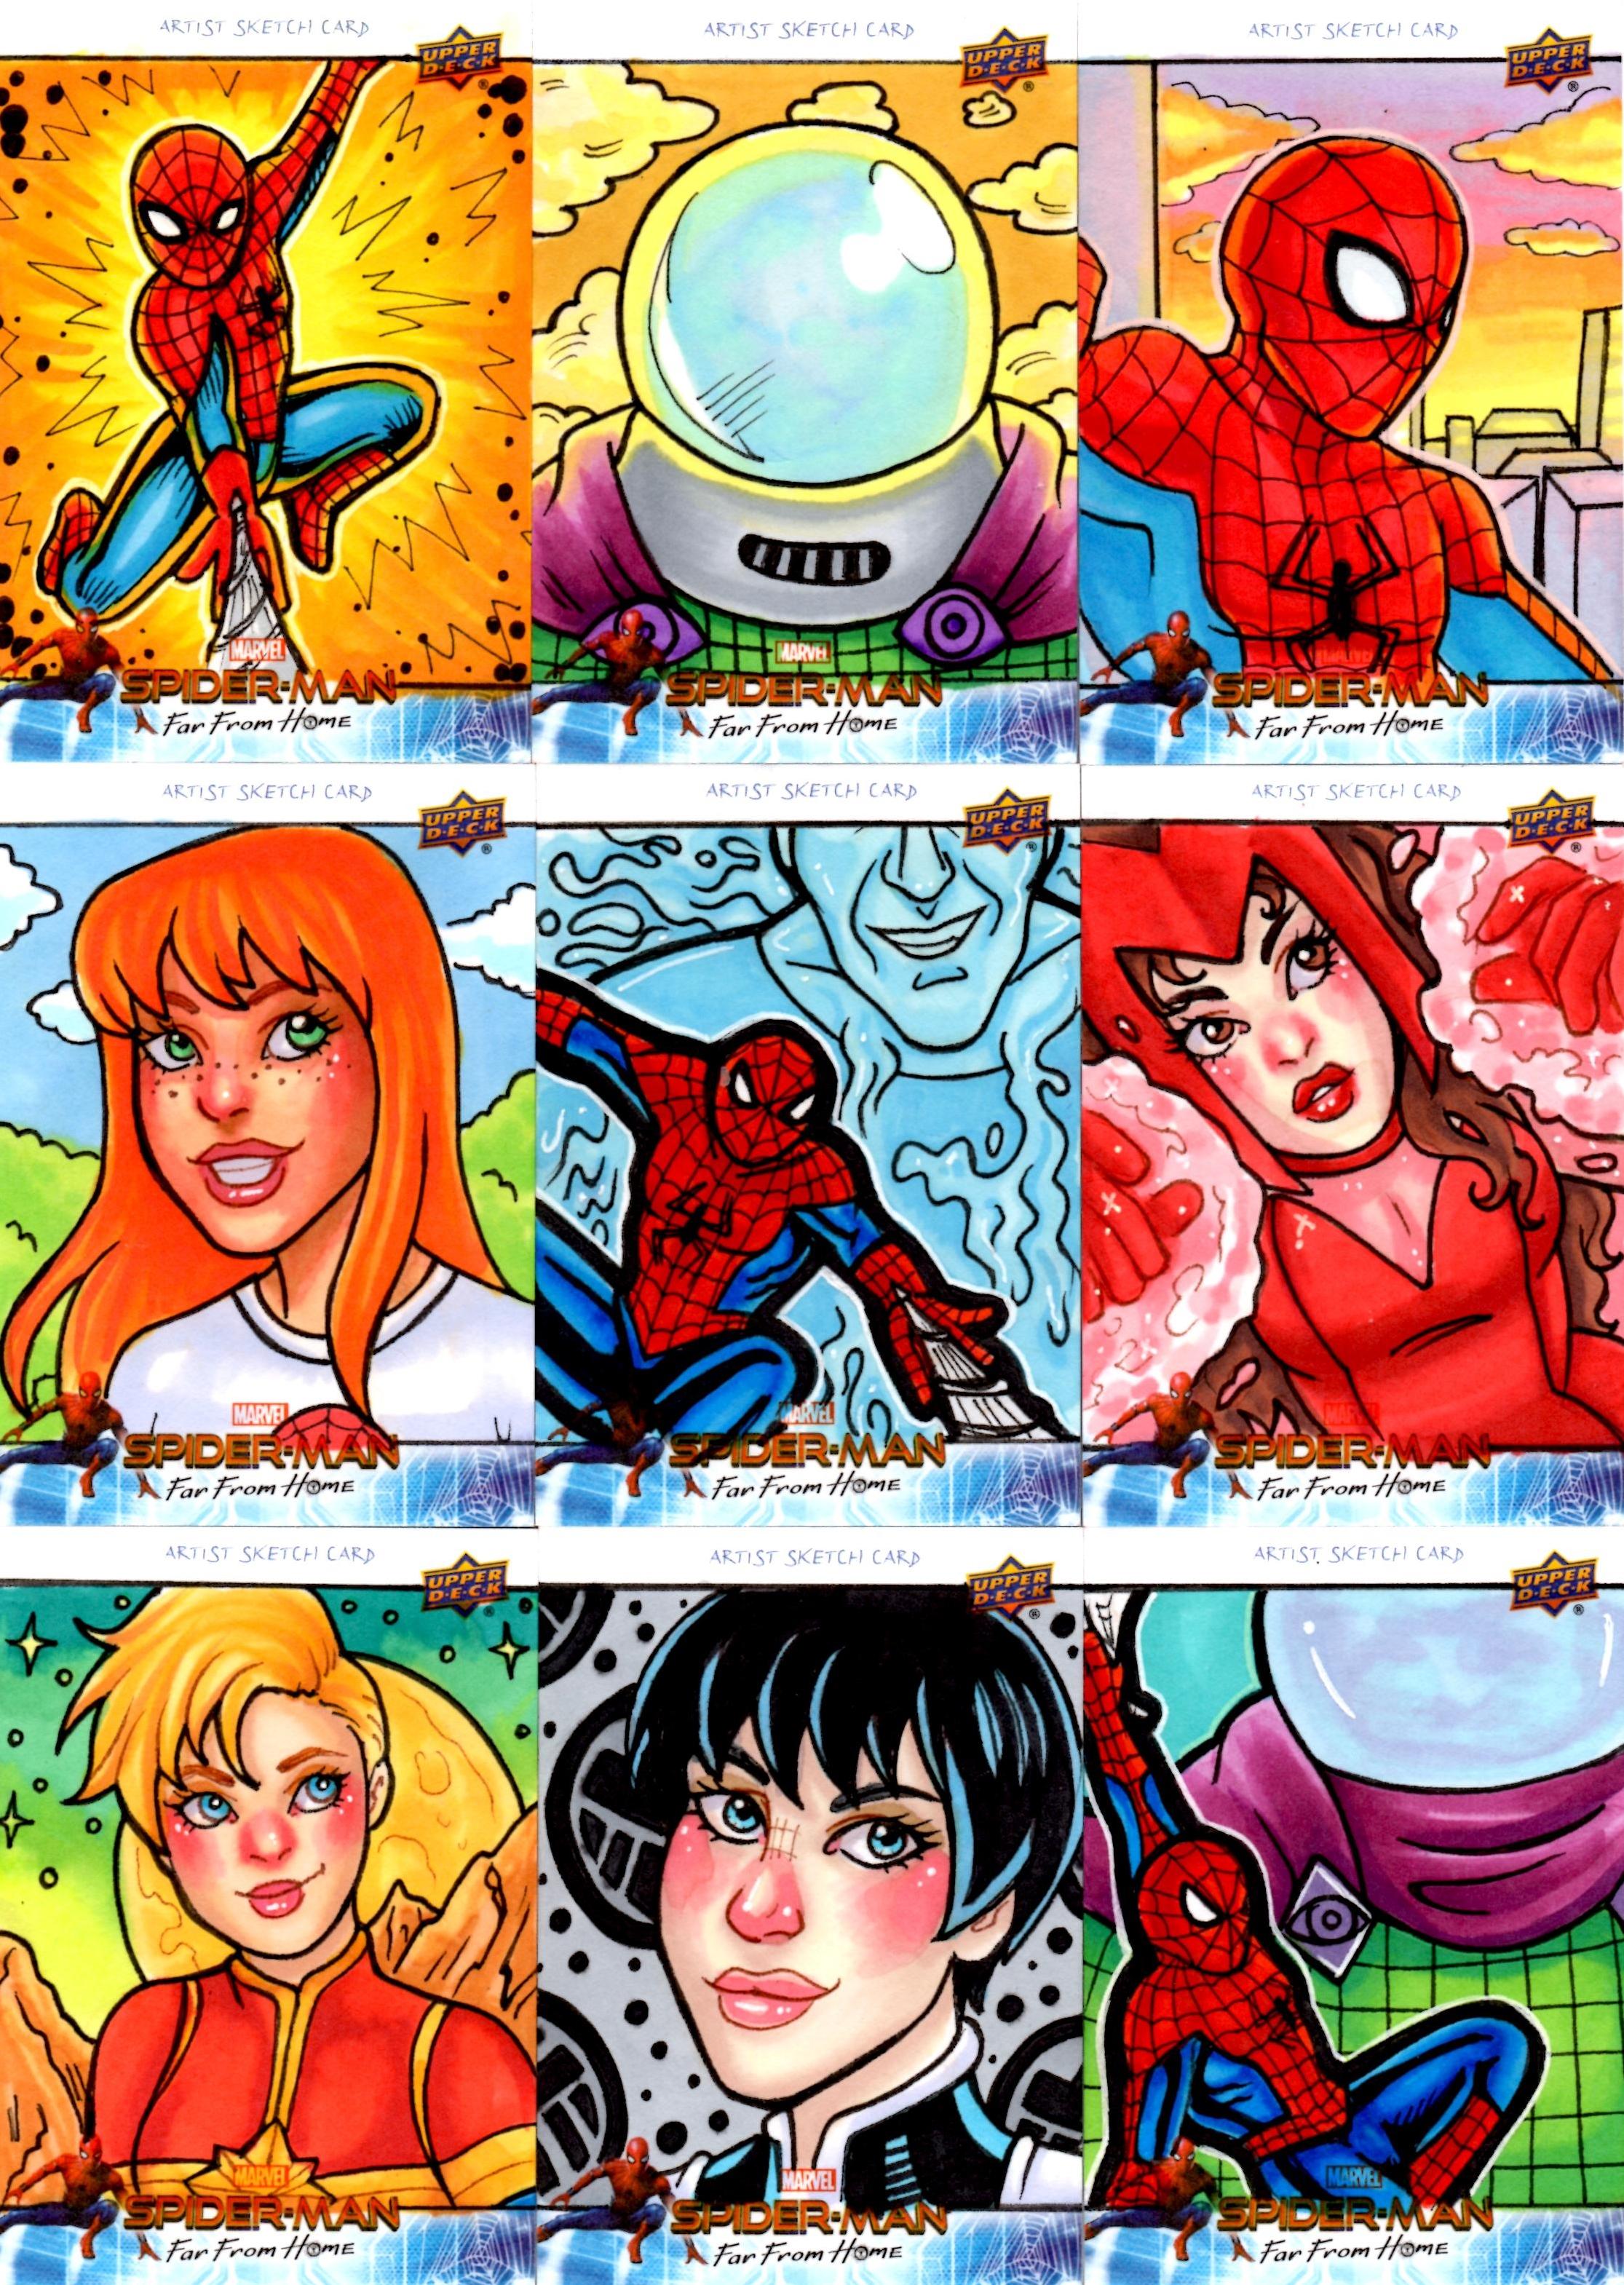 Spiderman FFH - Mai Irving (1)